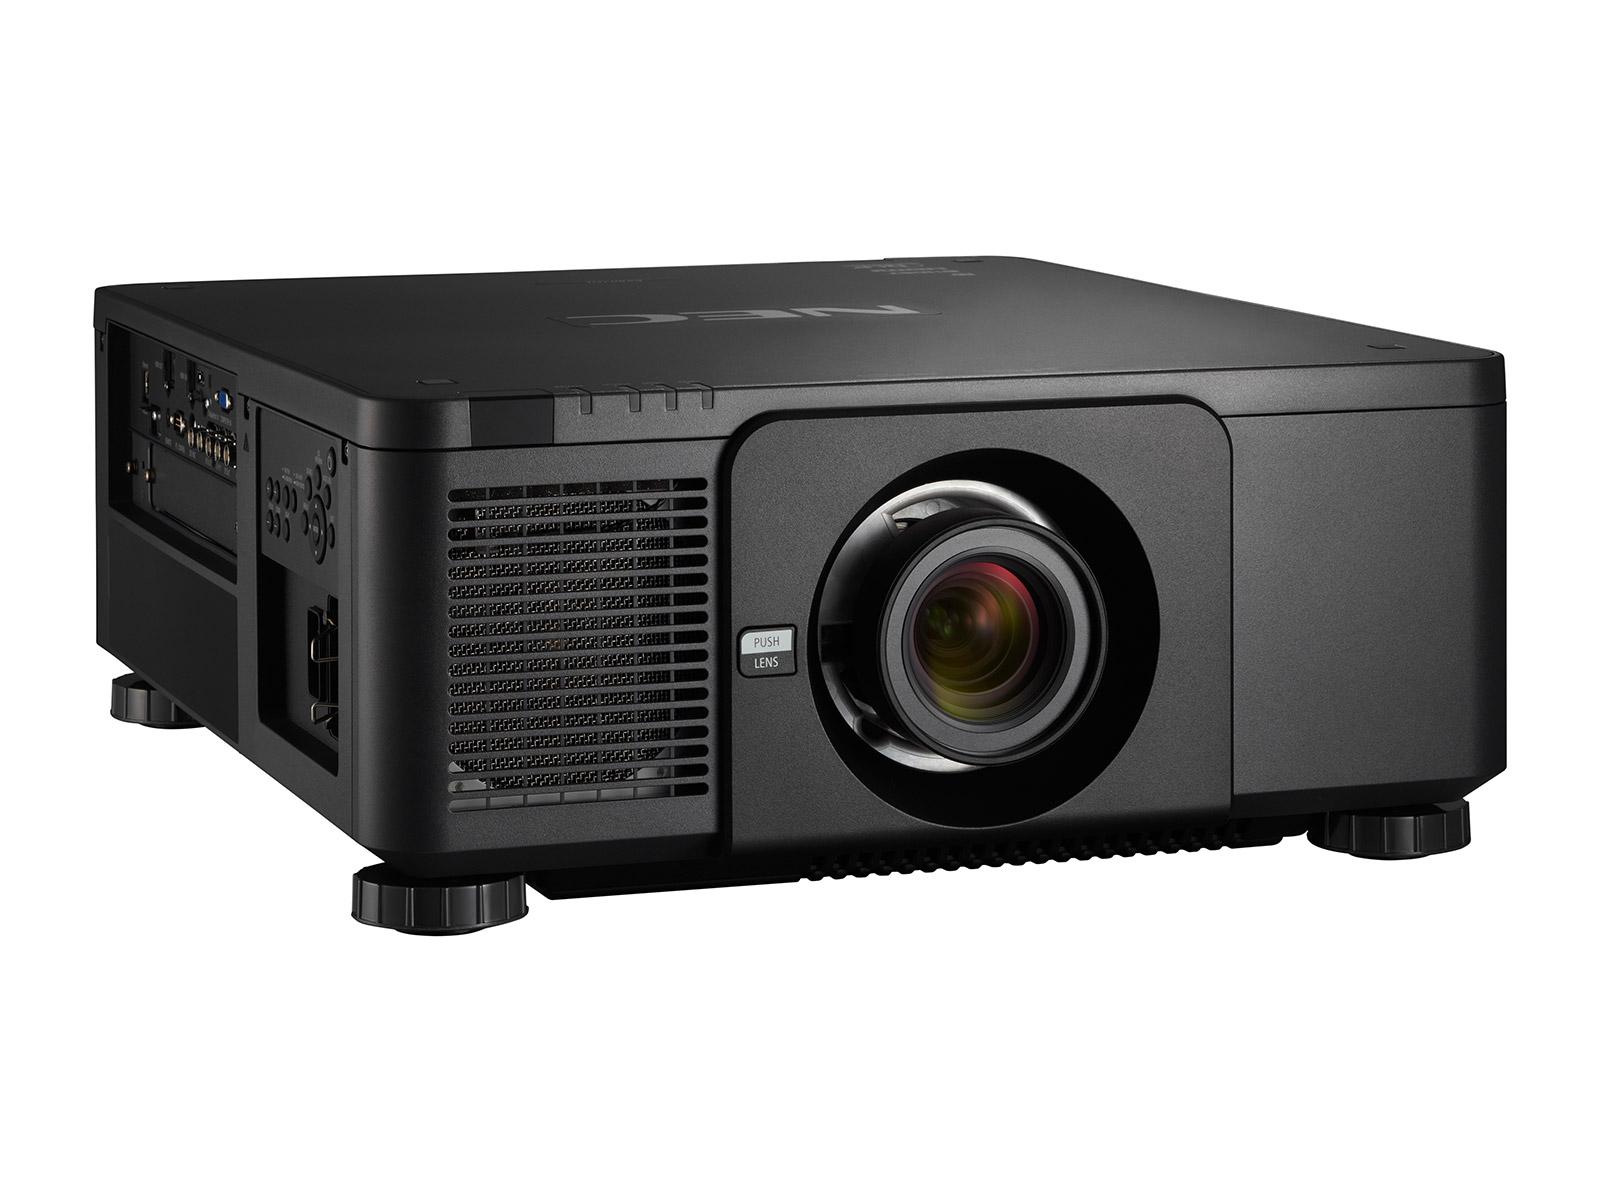 NEC PX803UL Black Projector - 8000 Lumens - WUXGA - Laser Projector (Optional Lenses)